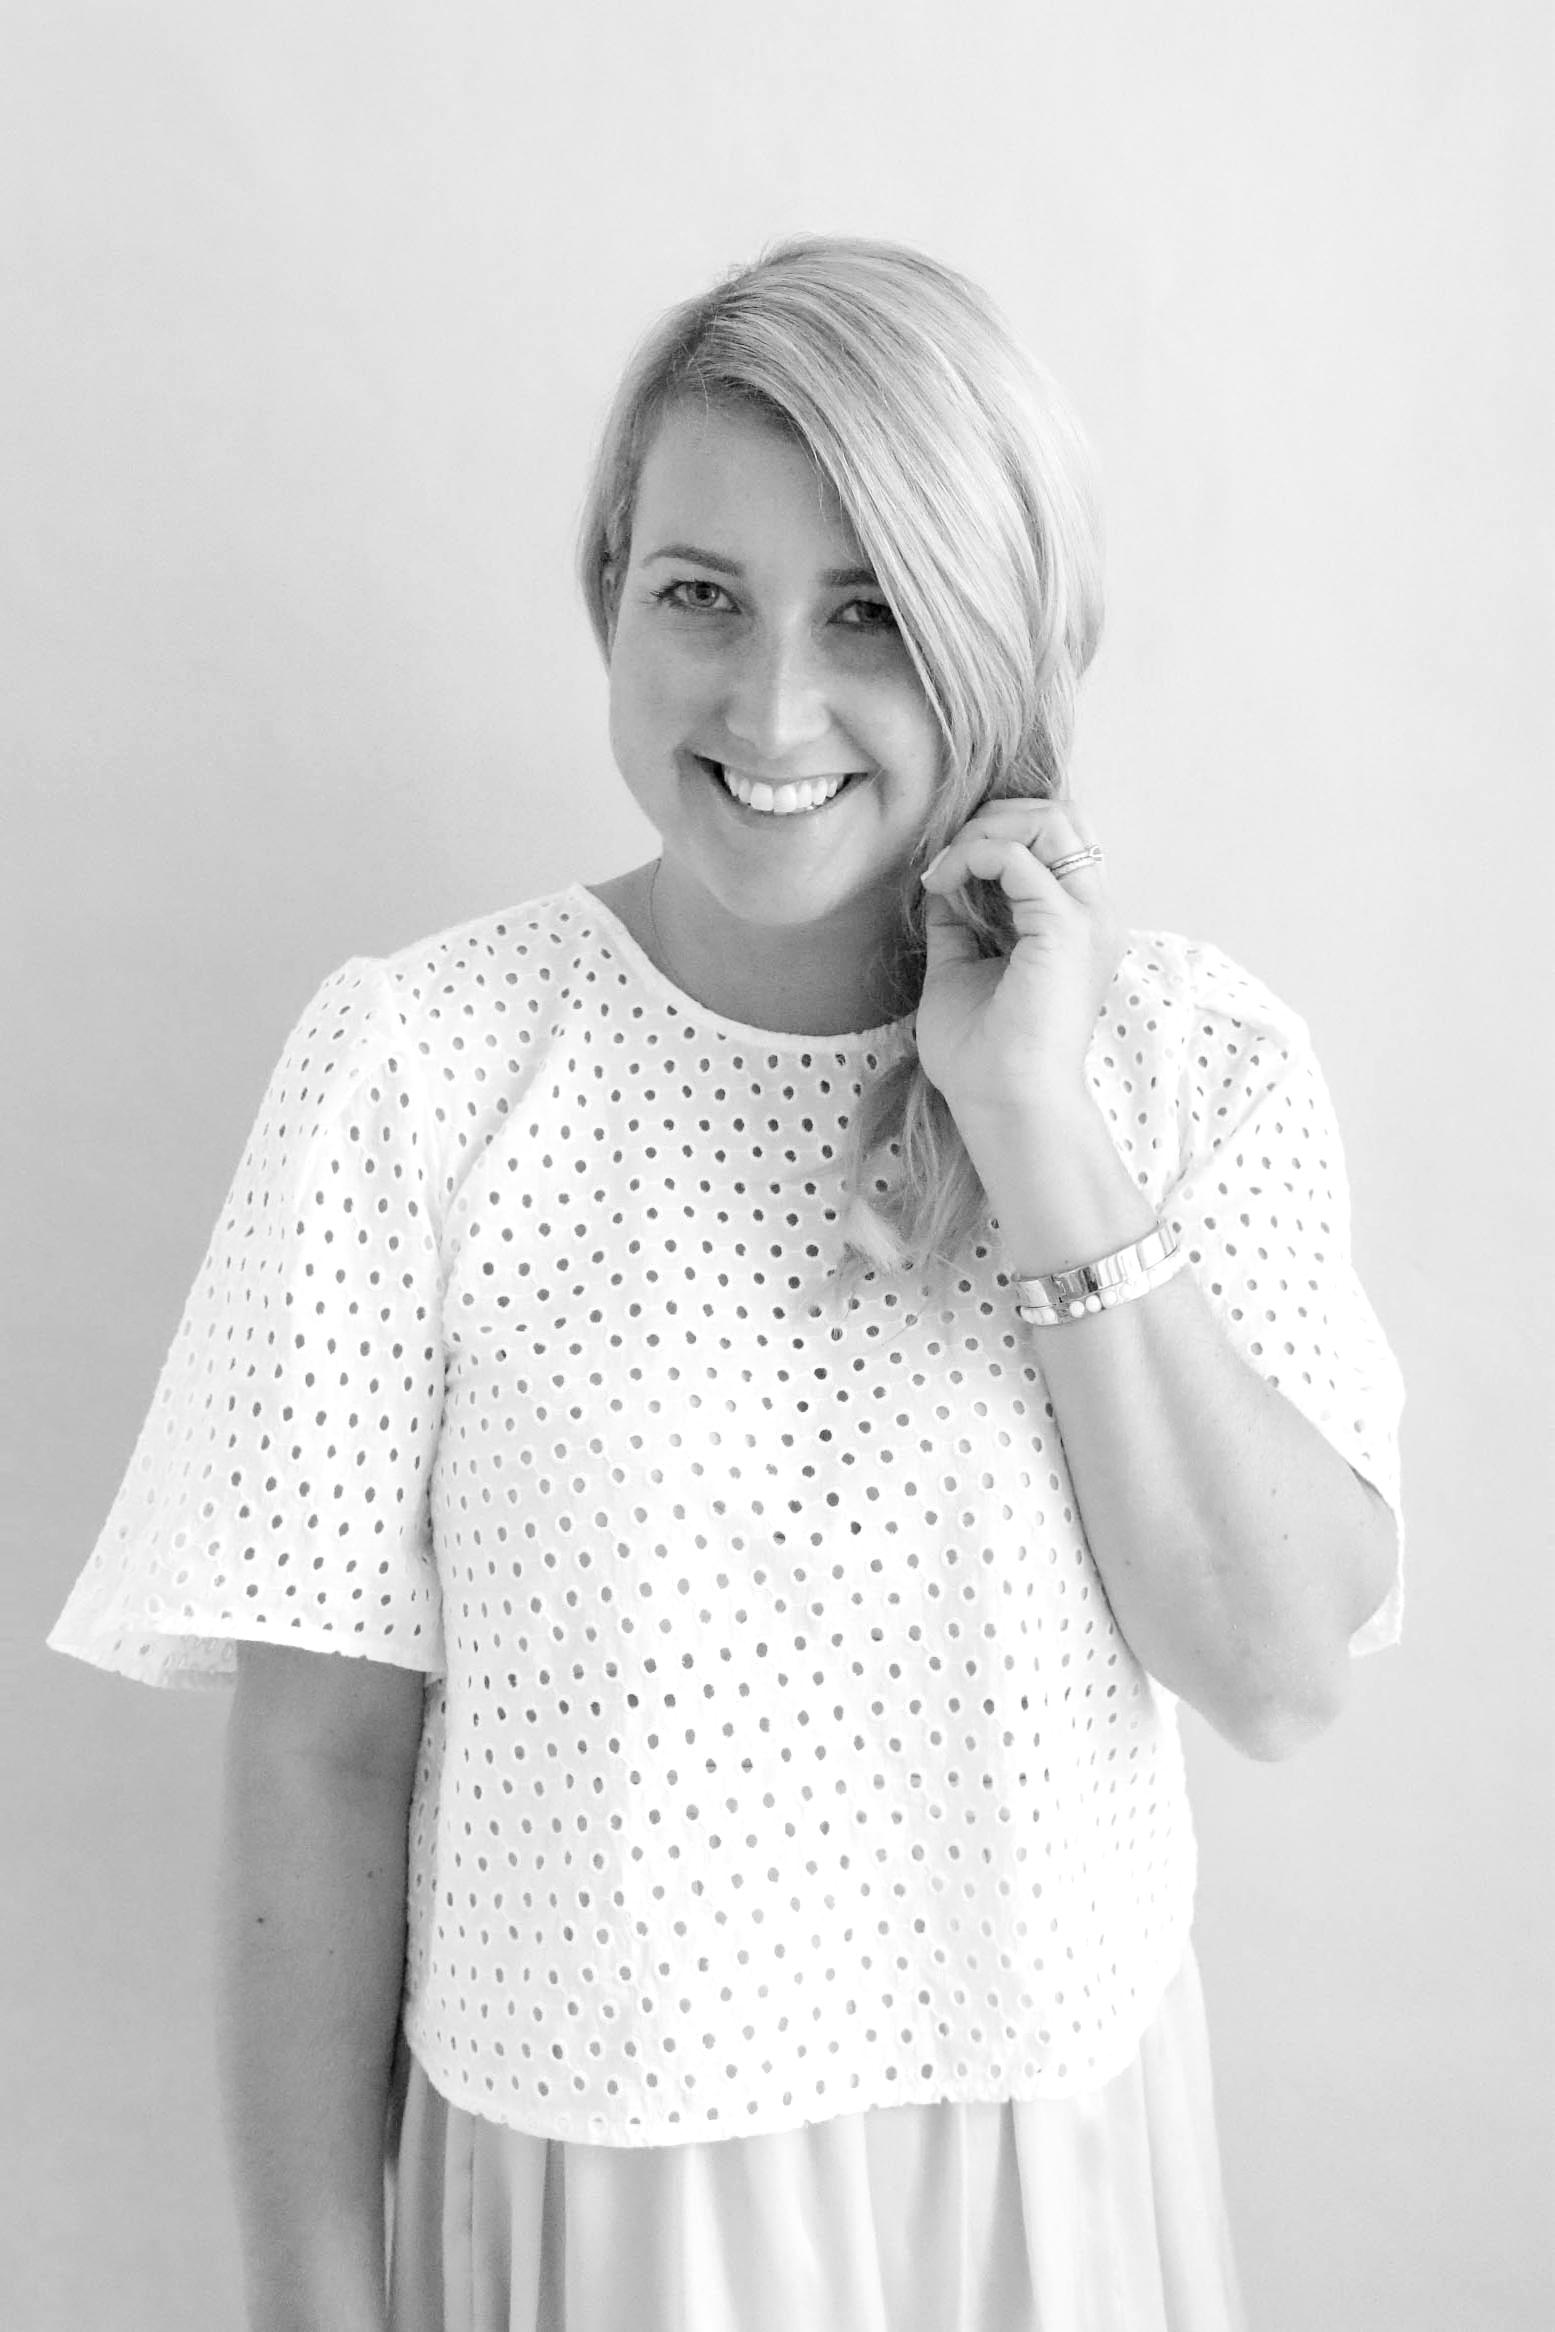 Dermalogica Monika Hibbs